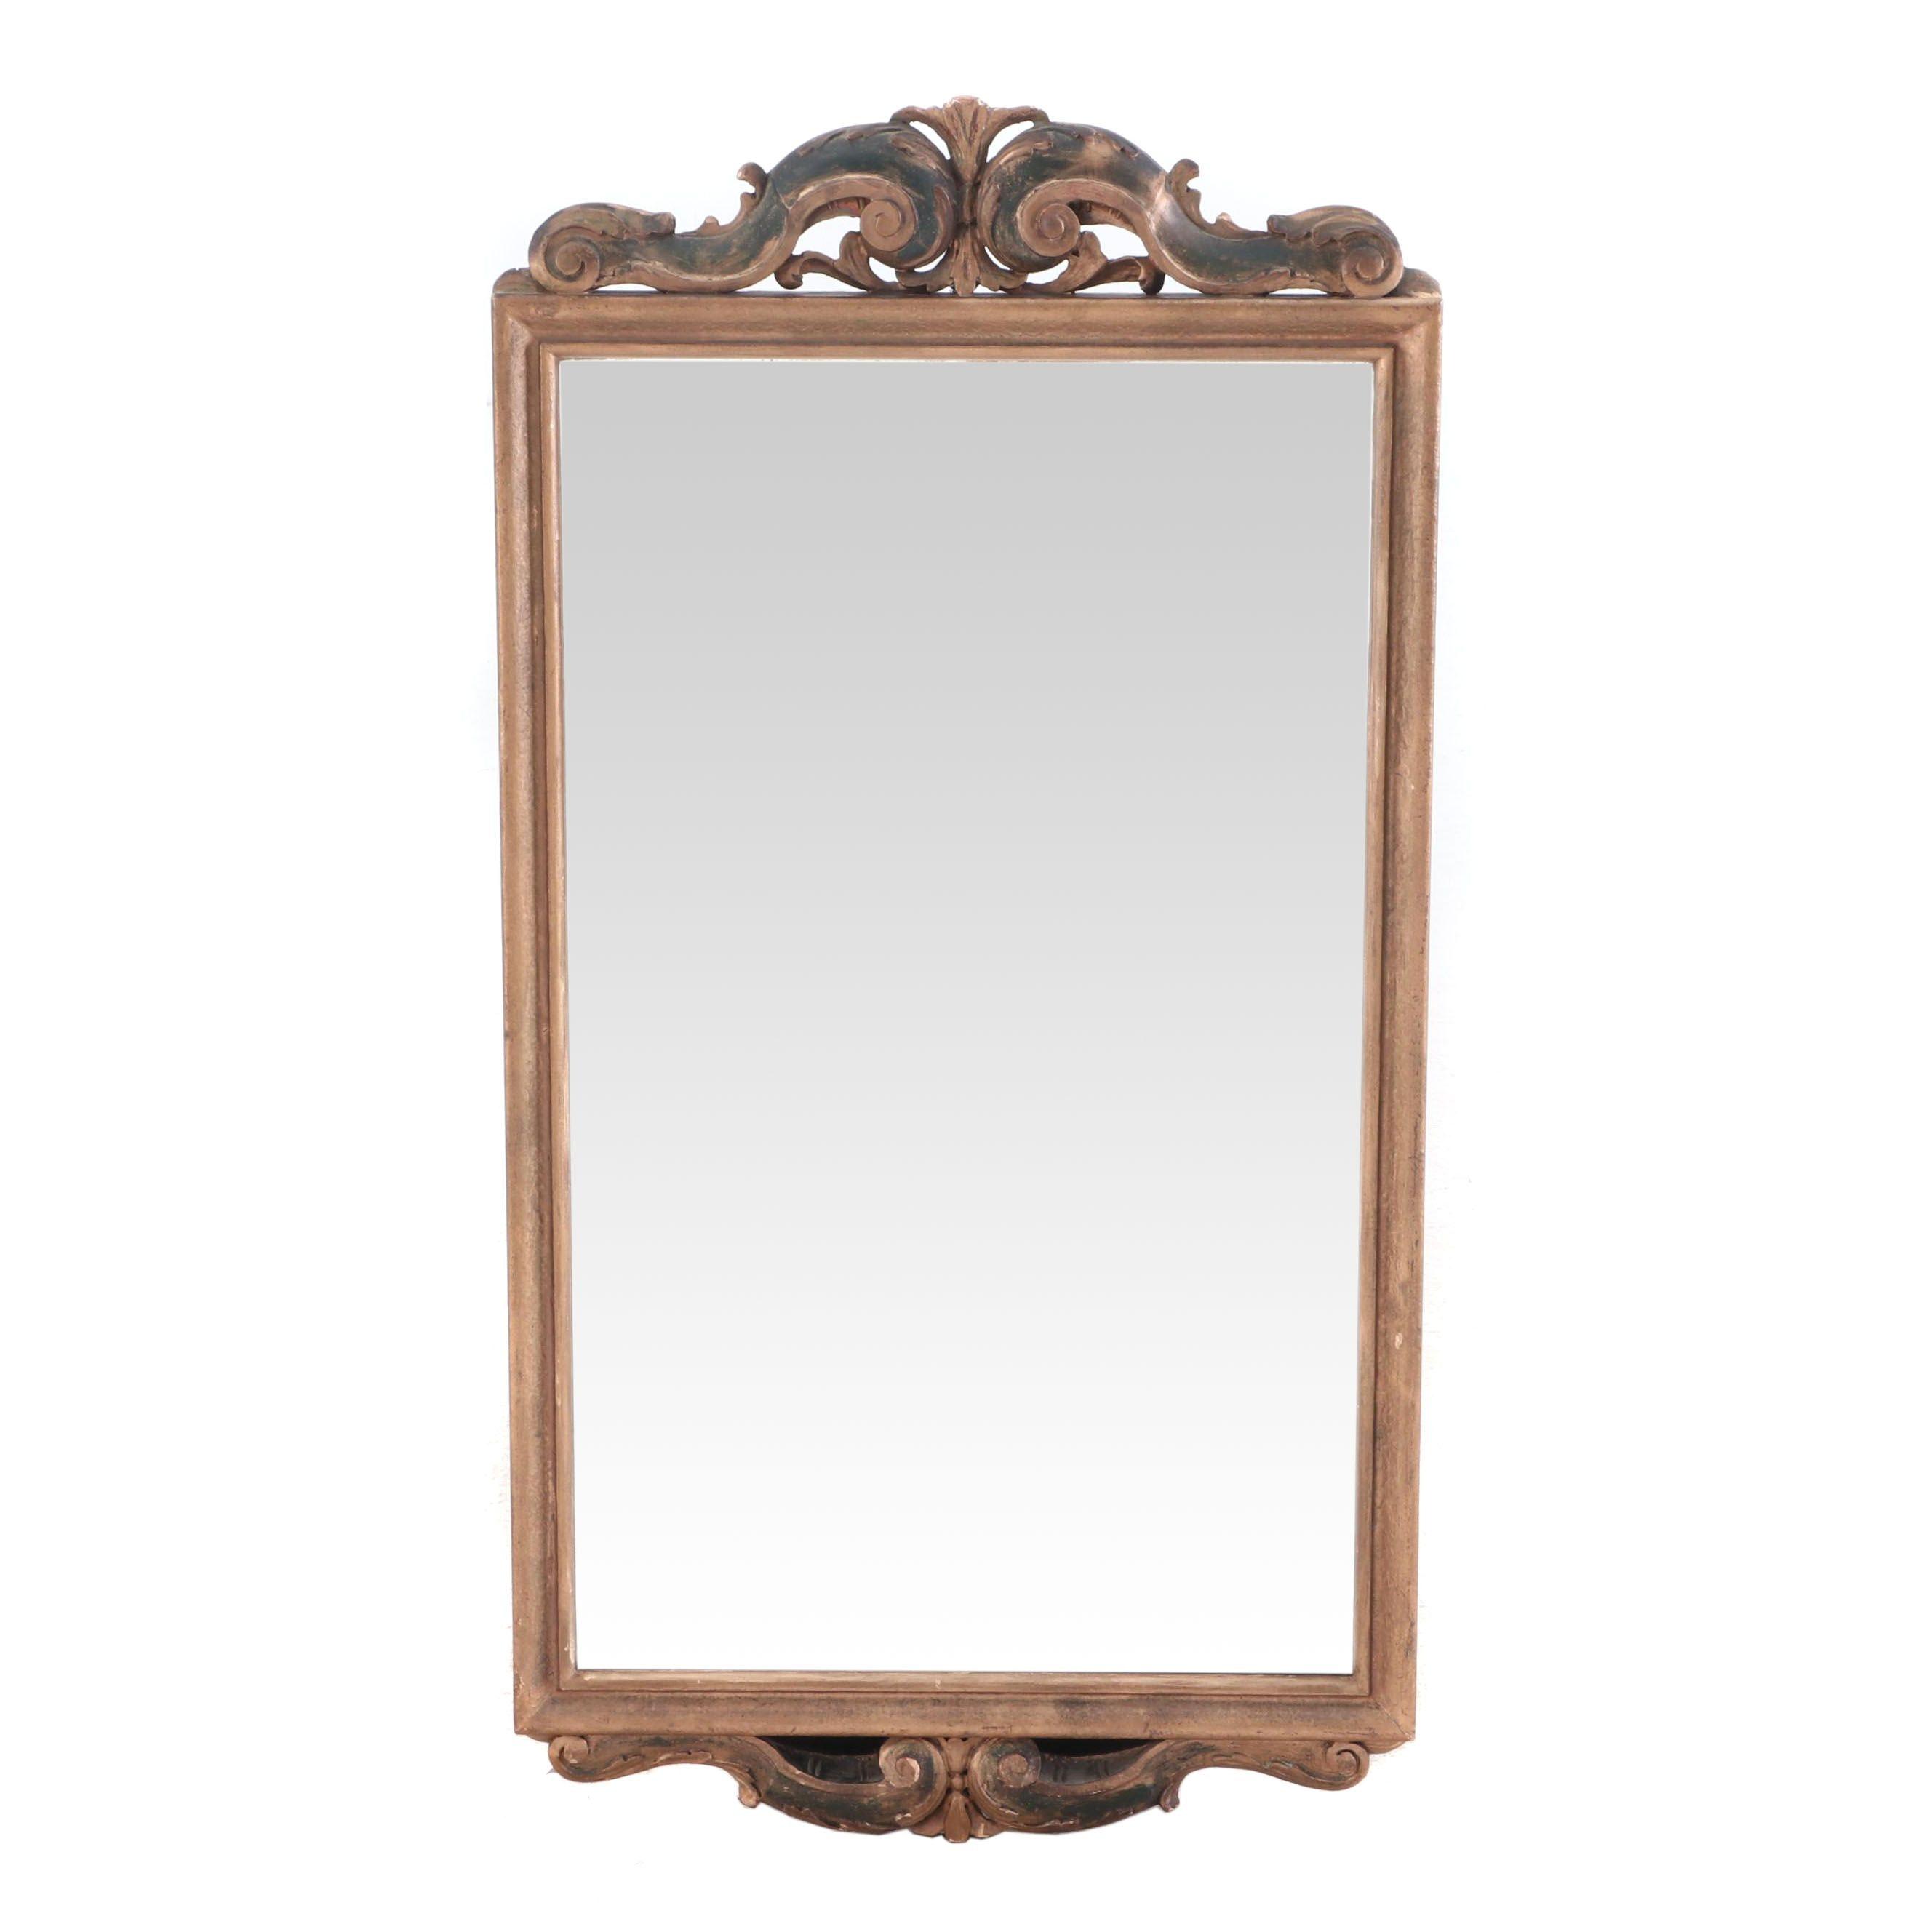 Scrolled Pediment Gilt Finish Wall Mirror